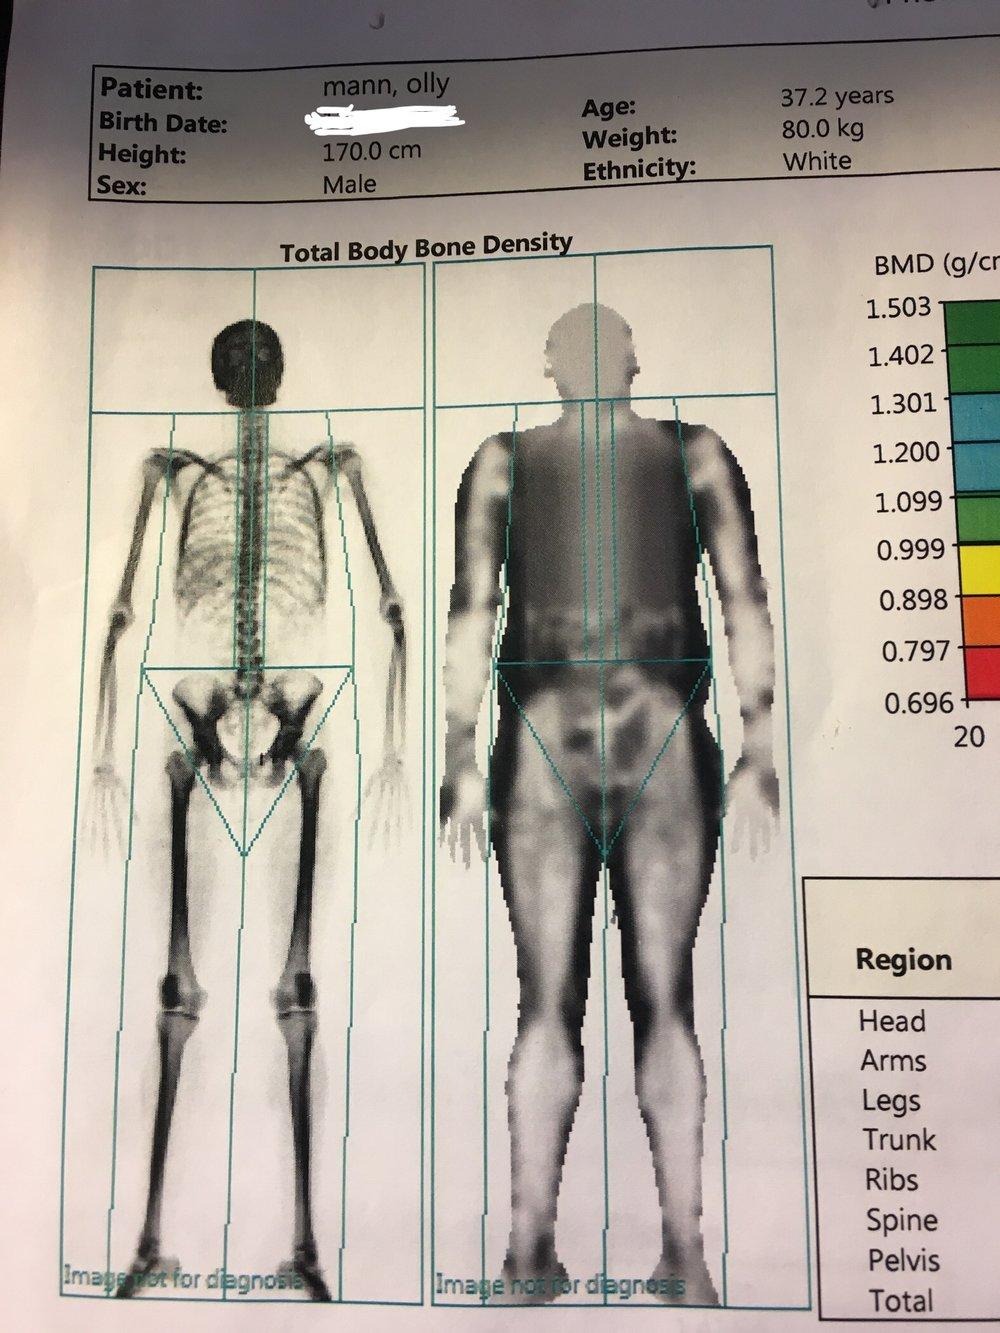 Olly Mann bodyscan.jpg